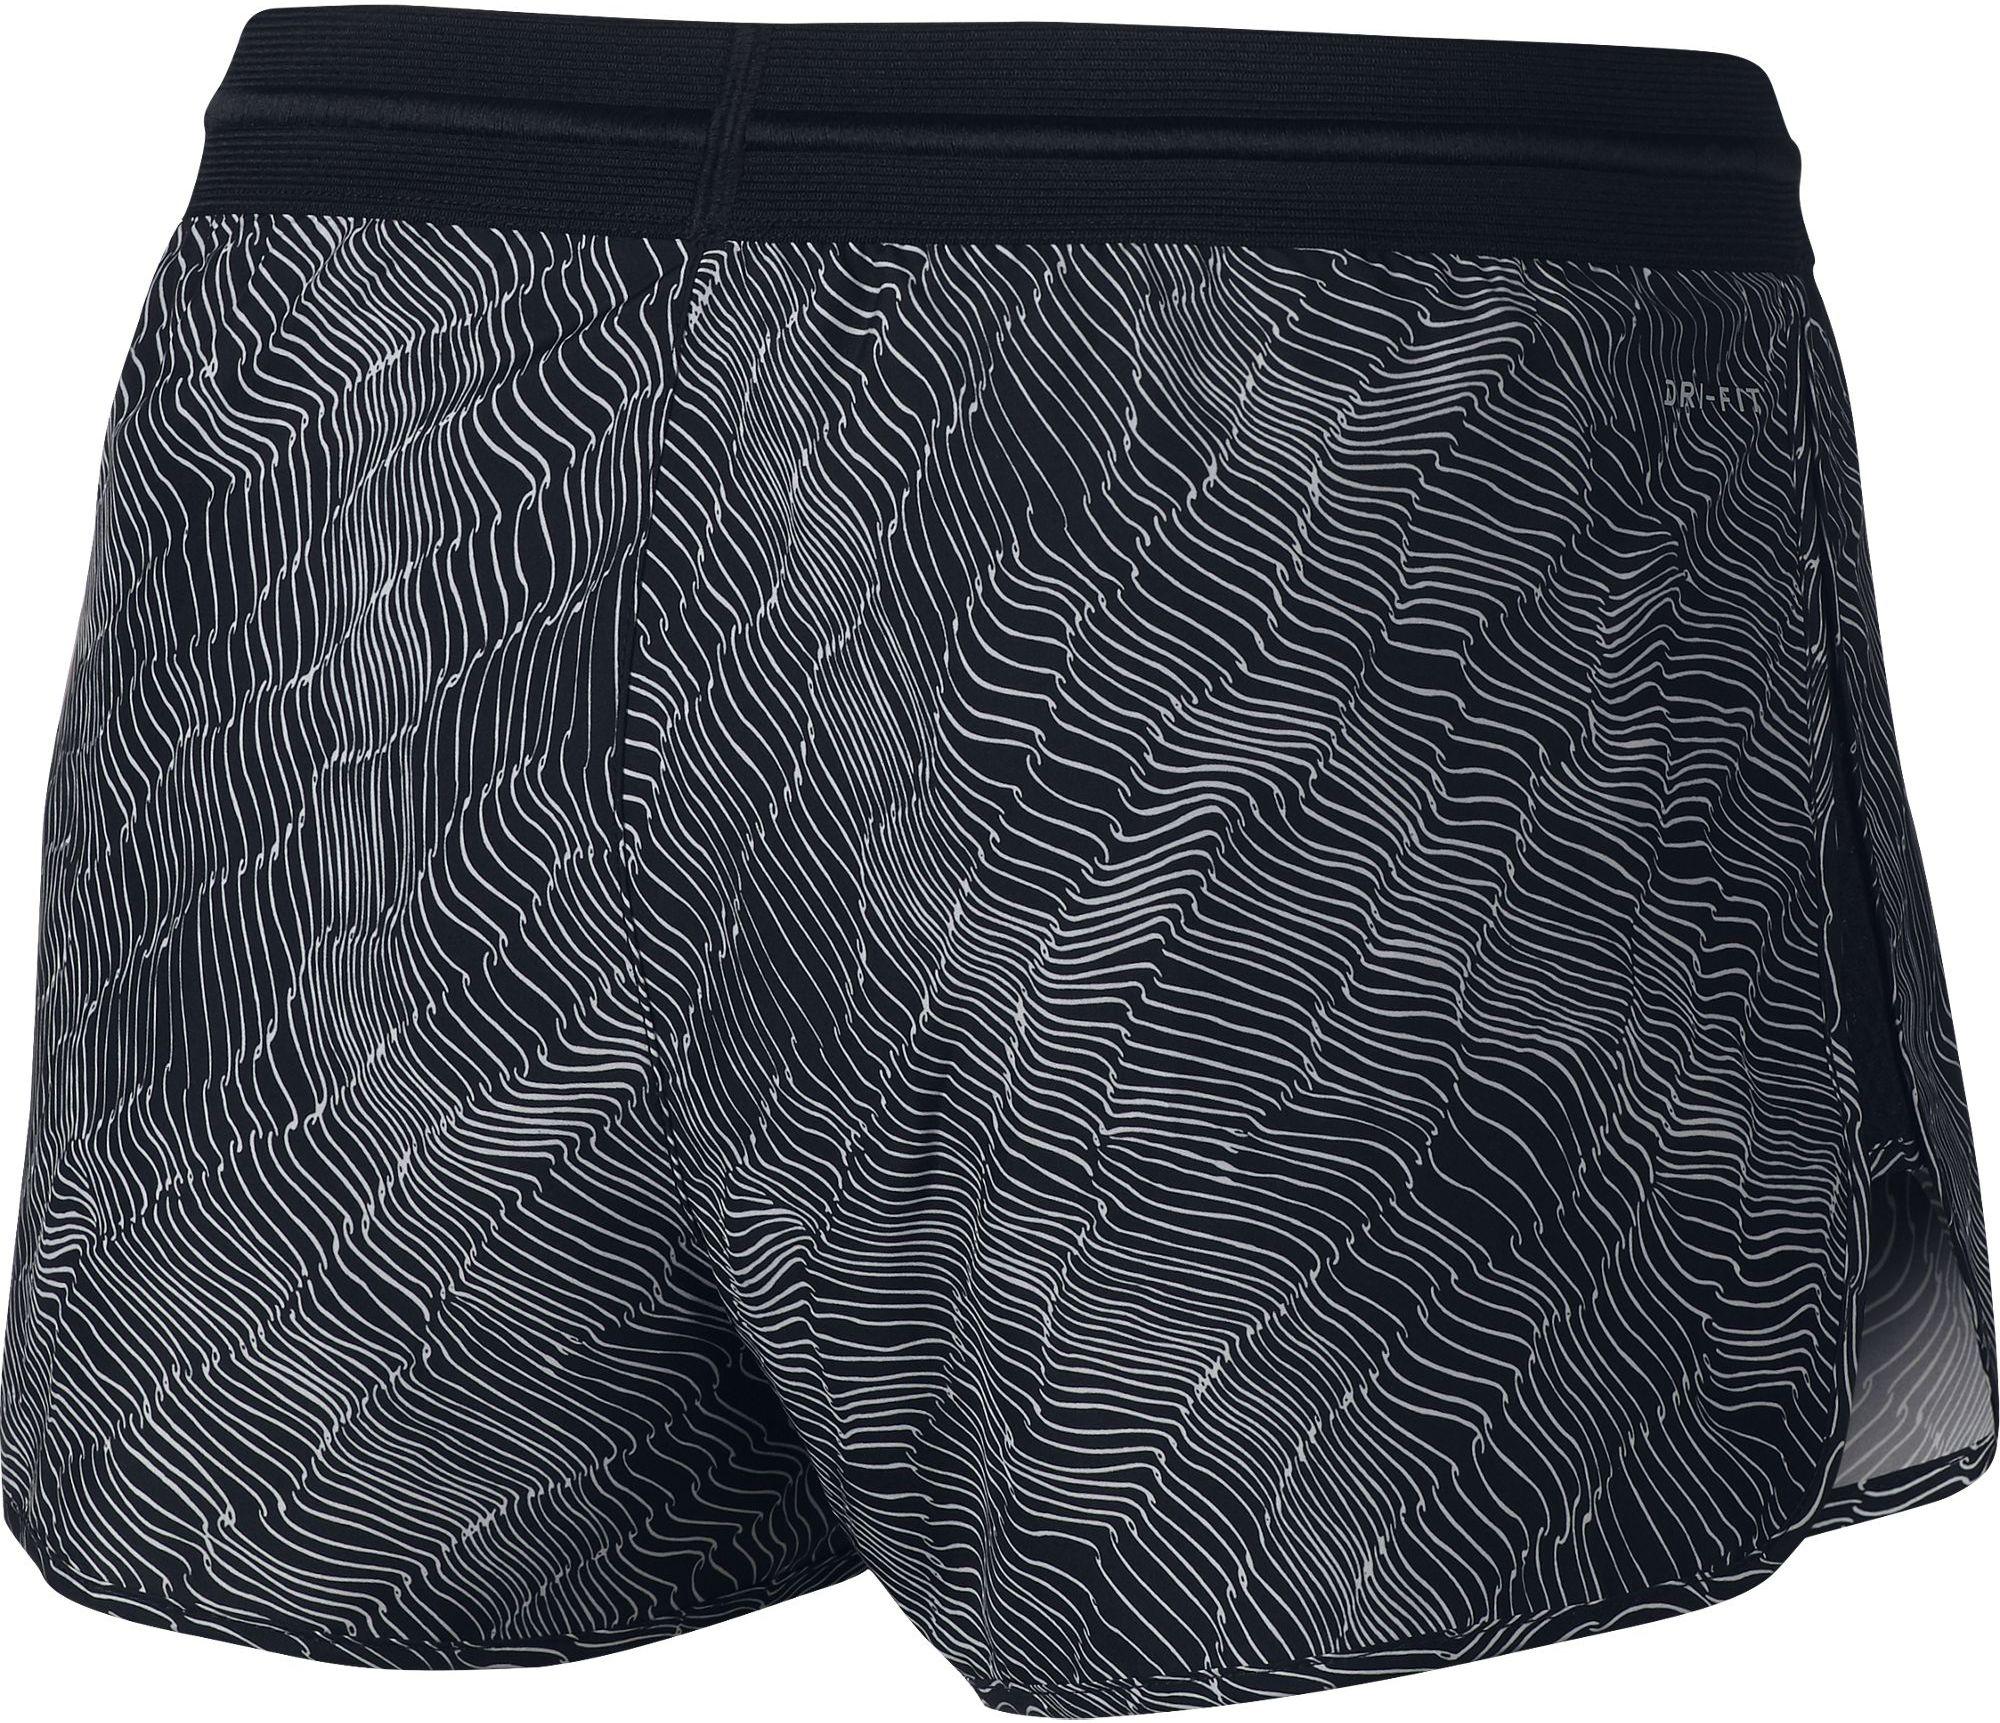 c30d9dedefb Nike NK DRY SHORT RUN FAST PR. Dámské sportovní šortky. Dámské sportovní  šortky